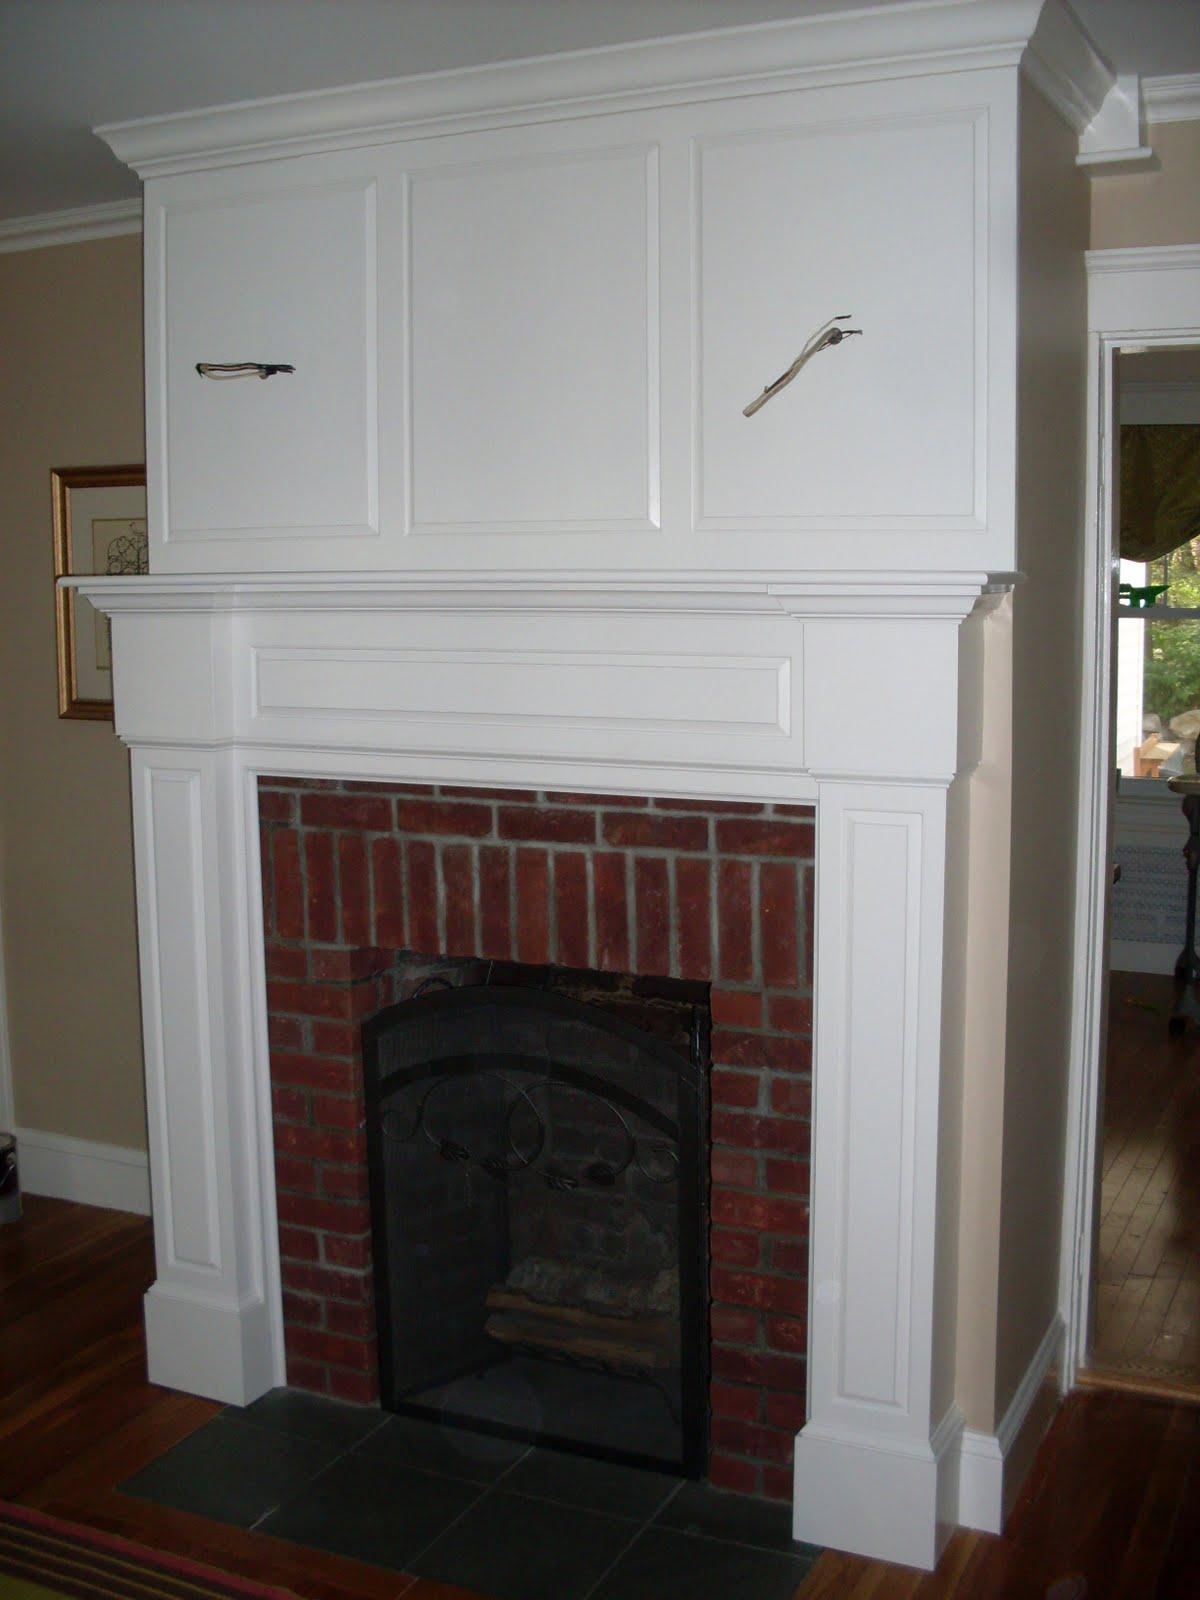 Brick Fireplace Mantel Shelf - Viewing Gallery